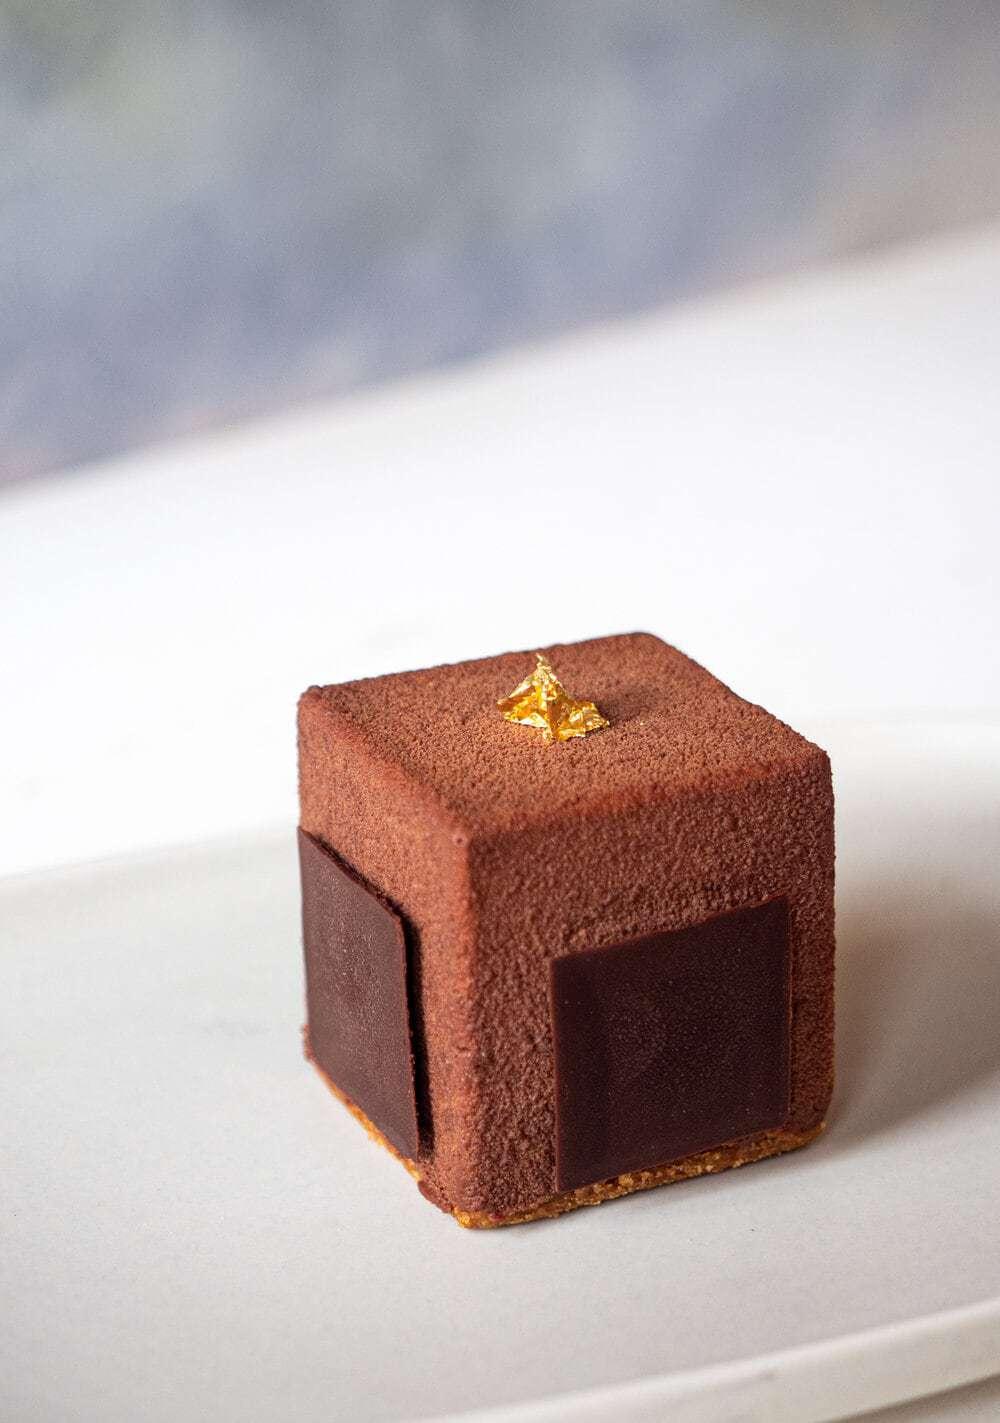 Chocolate, caramel and banana petit gateaux